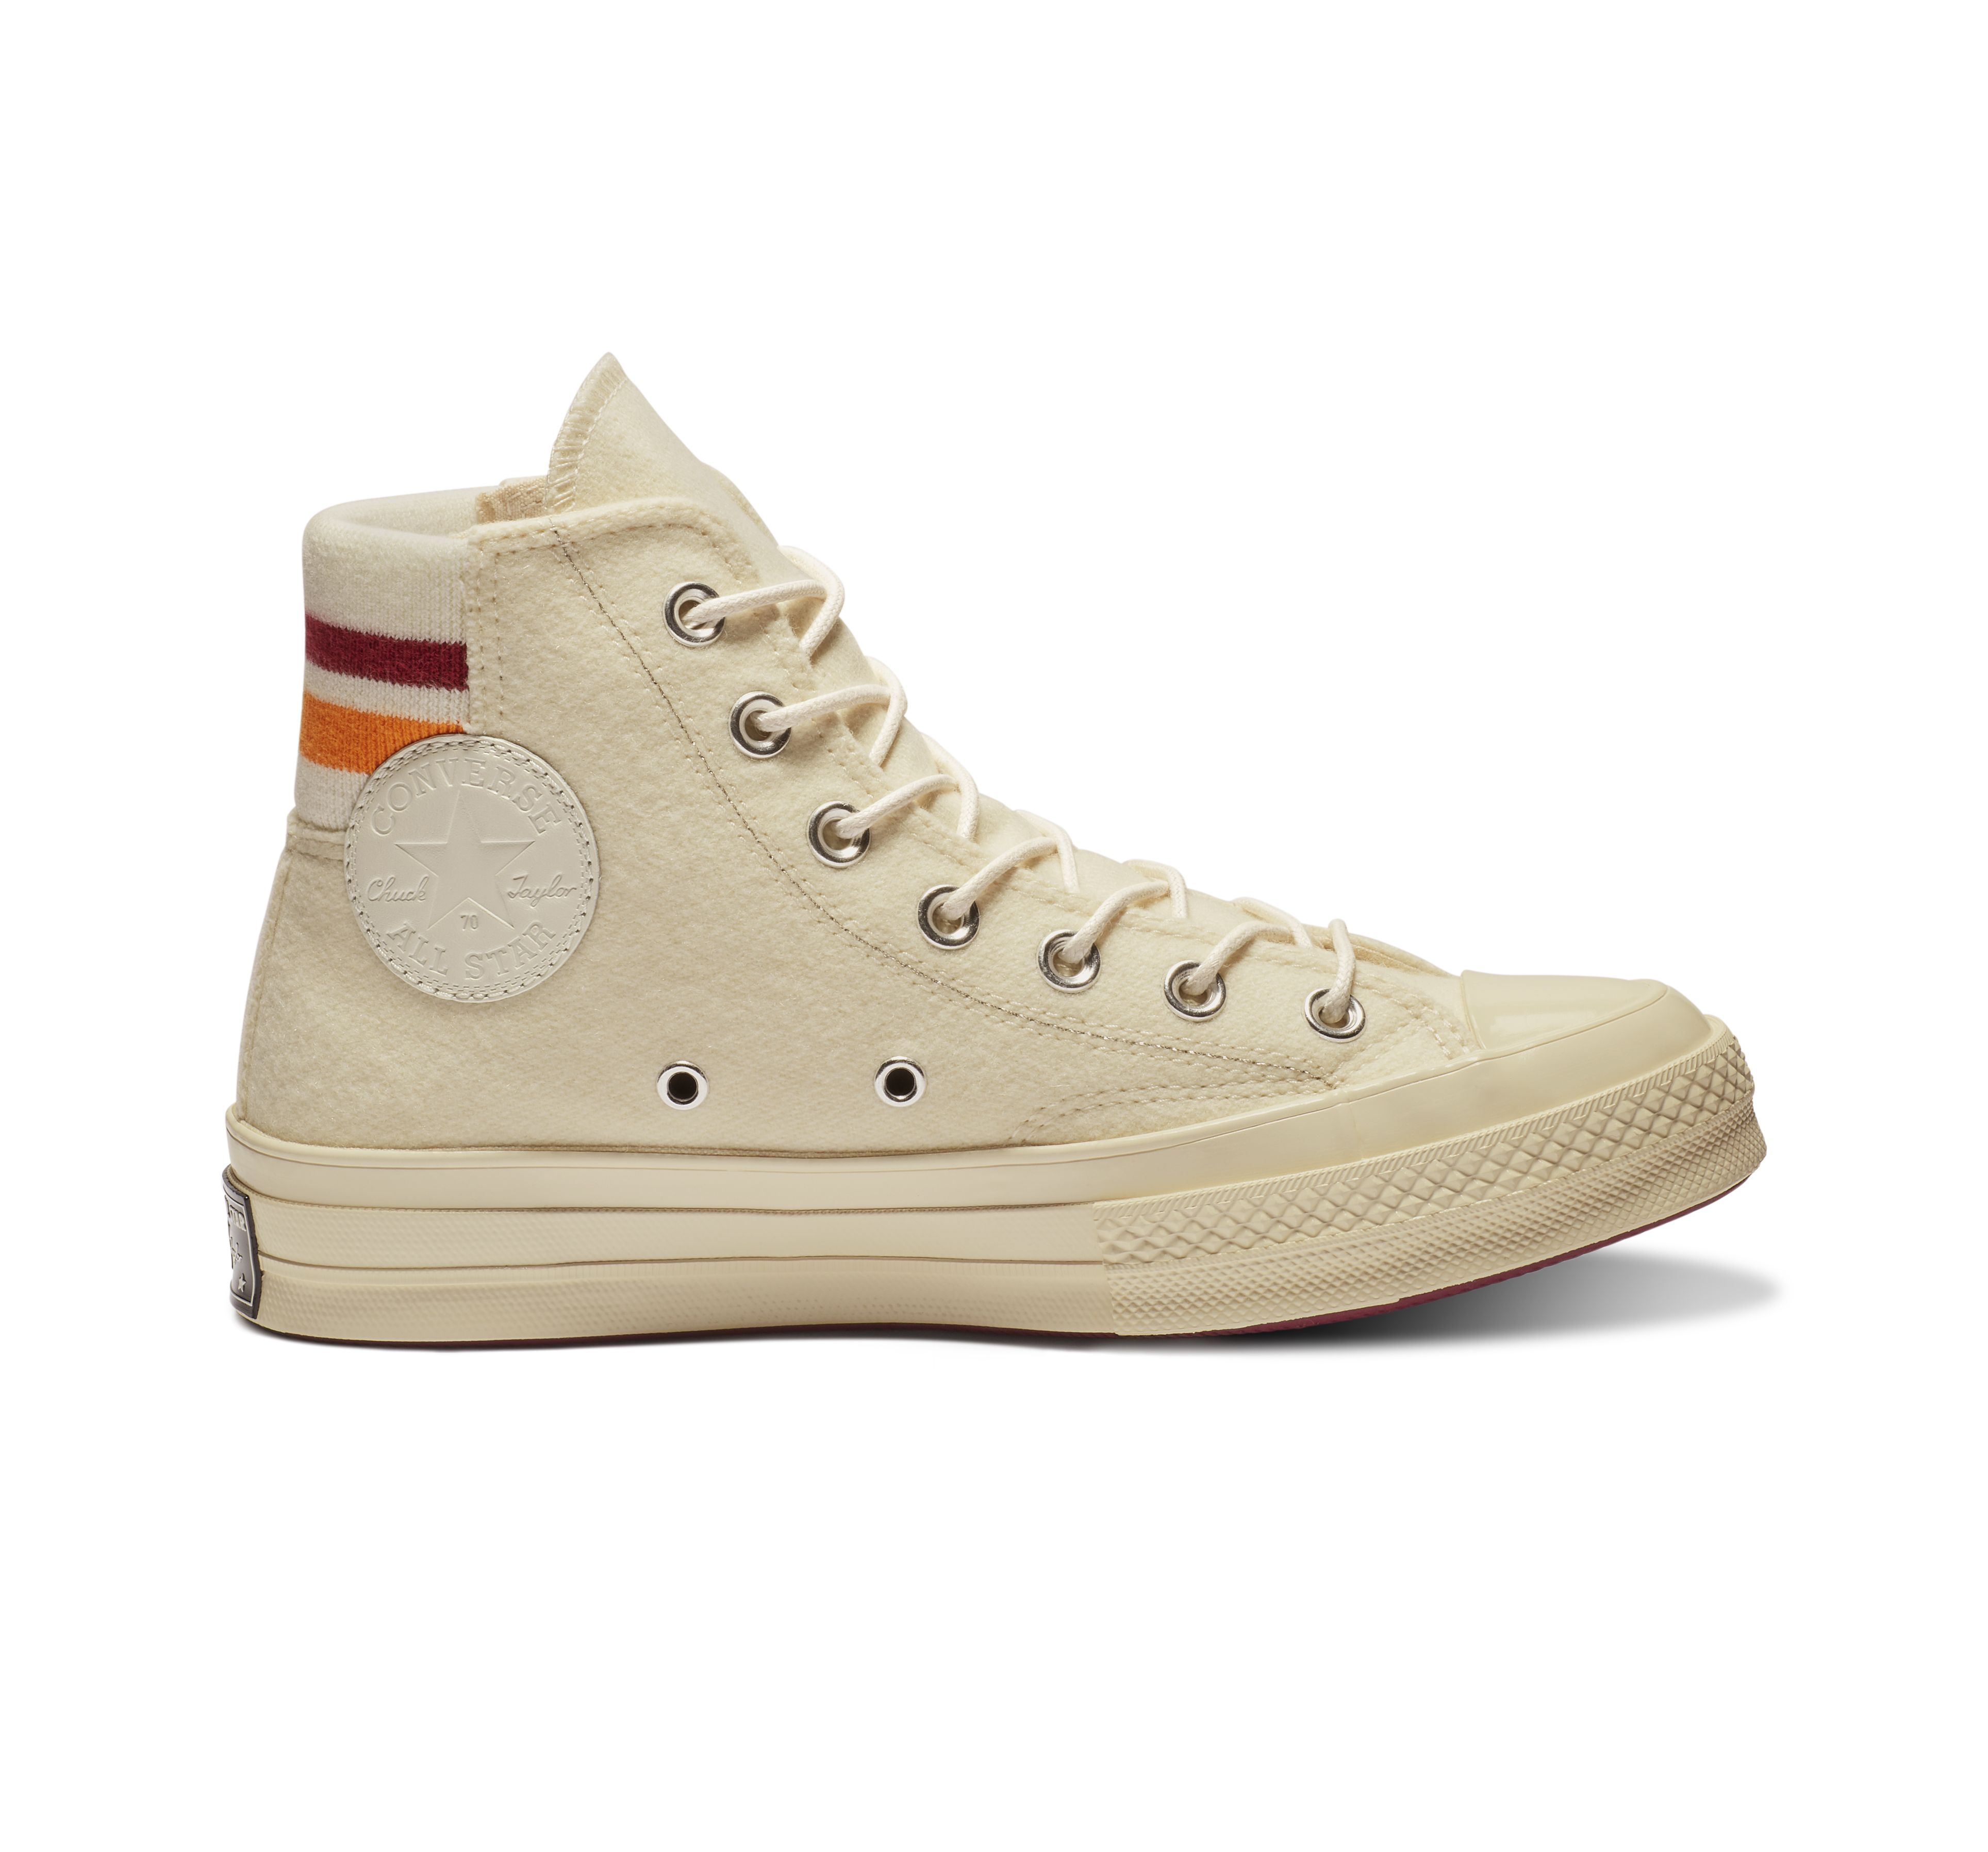 Retro shoes, Vintage sneakers